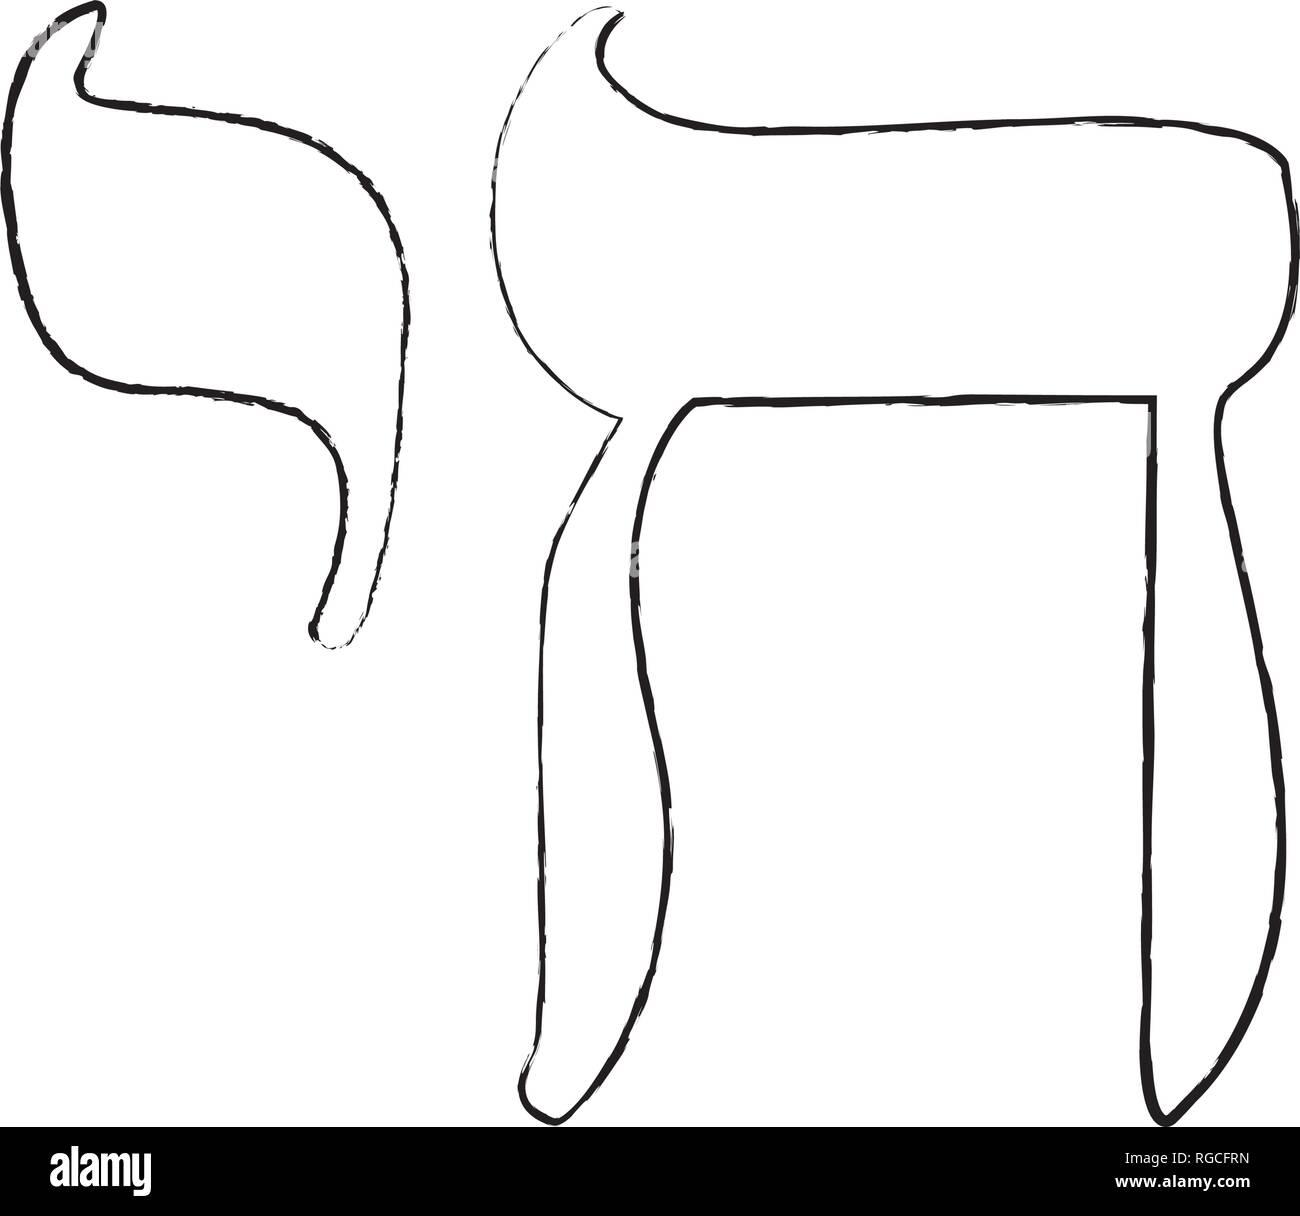 Jewish religion object - Stock Image